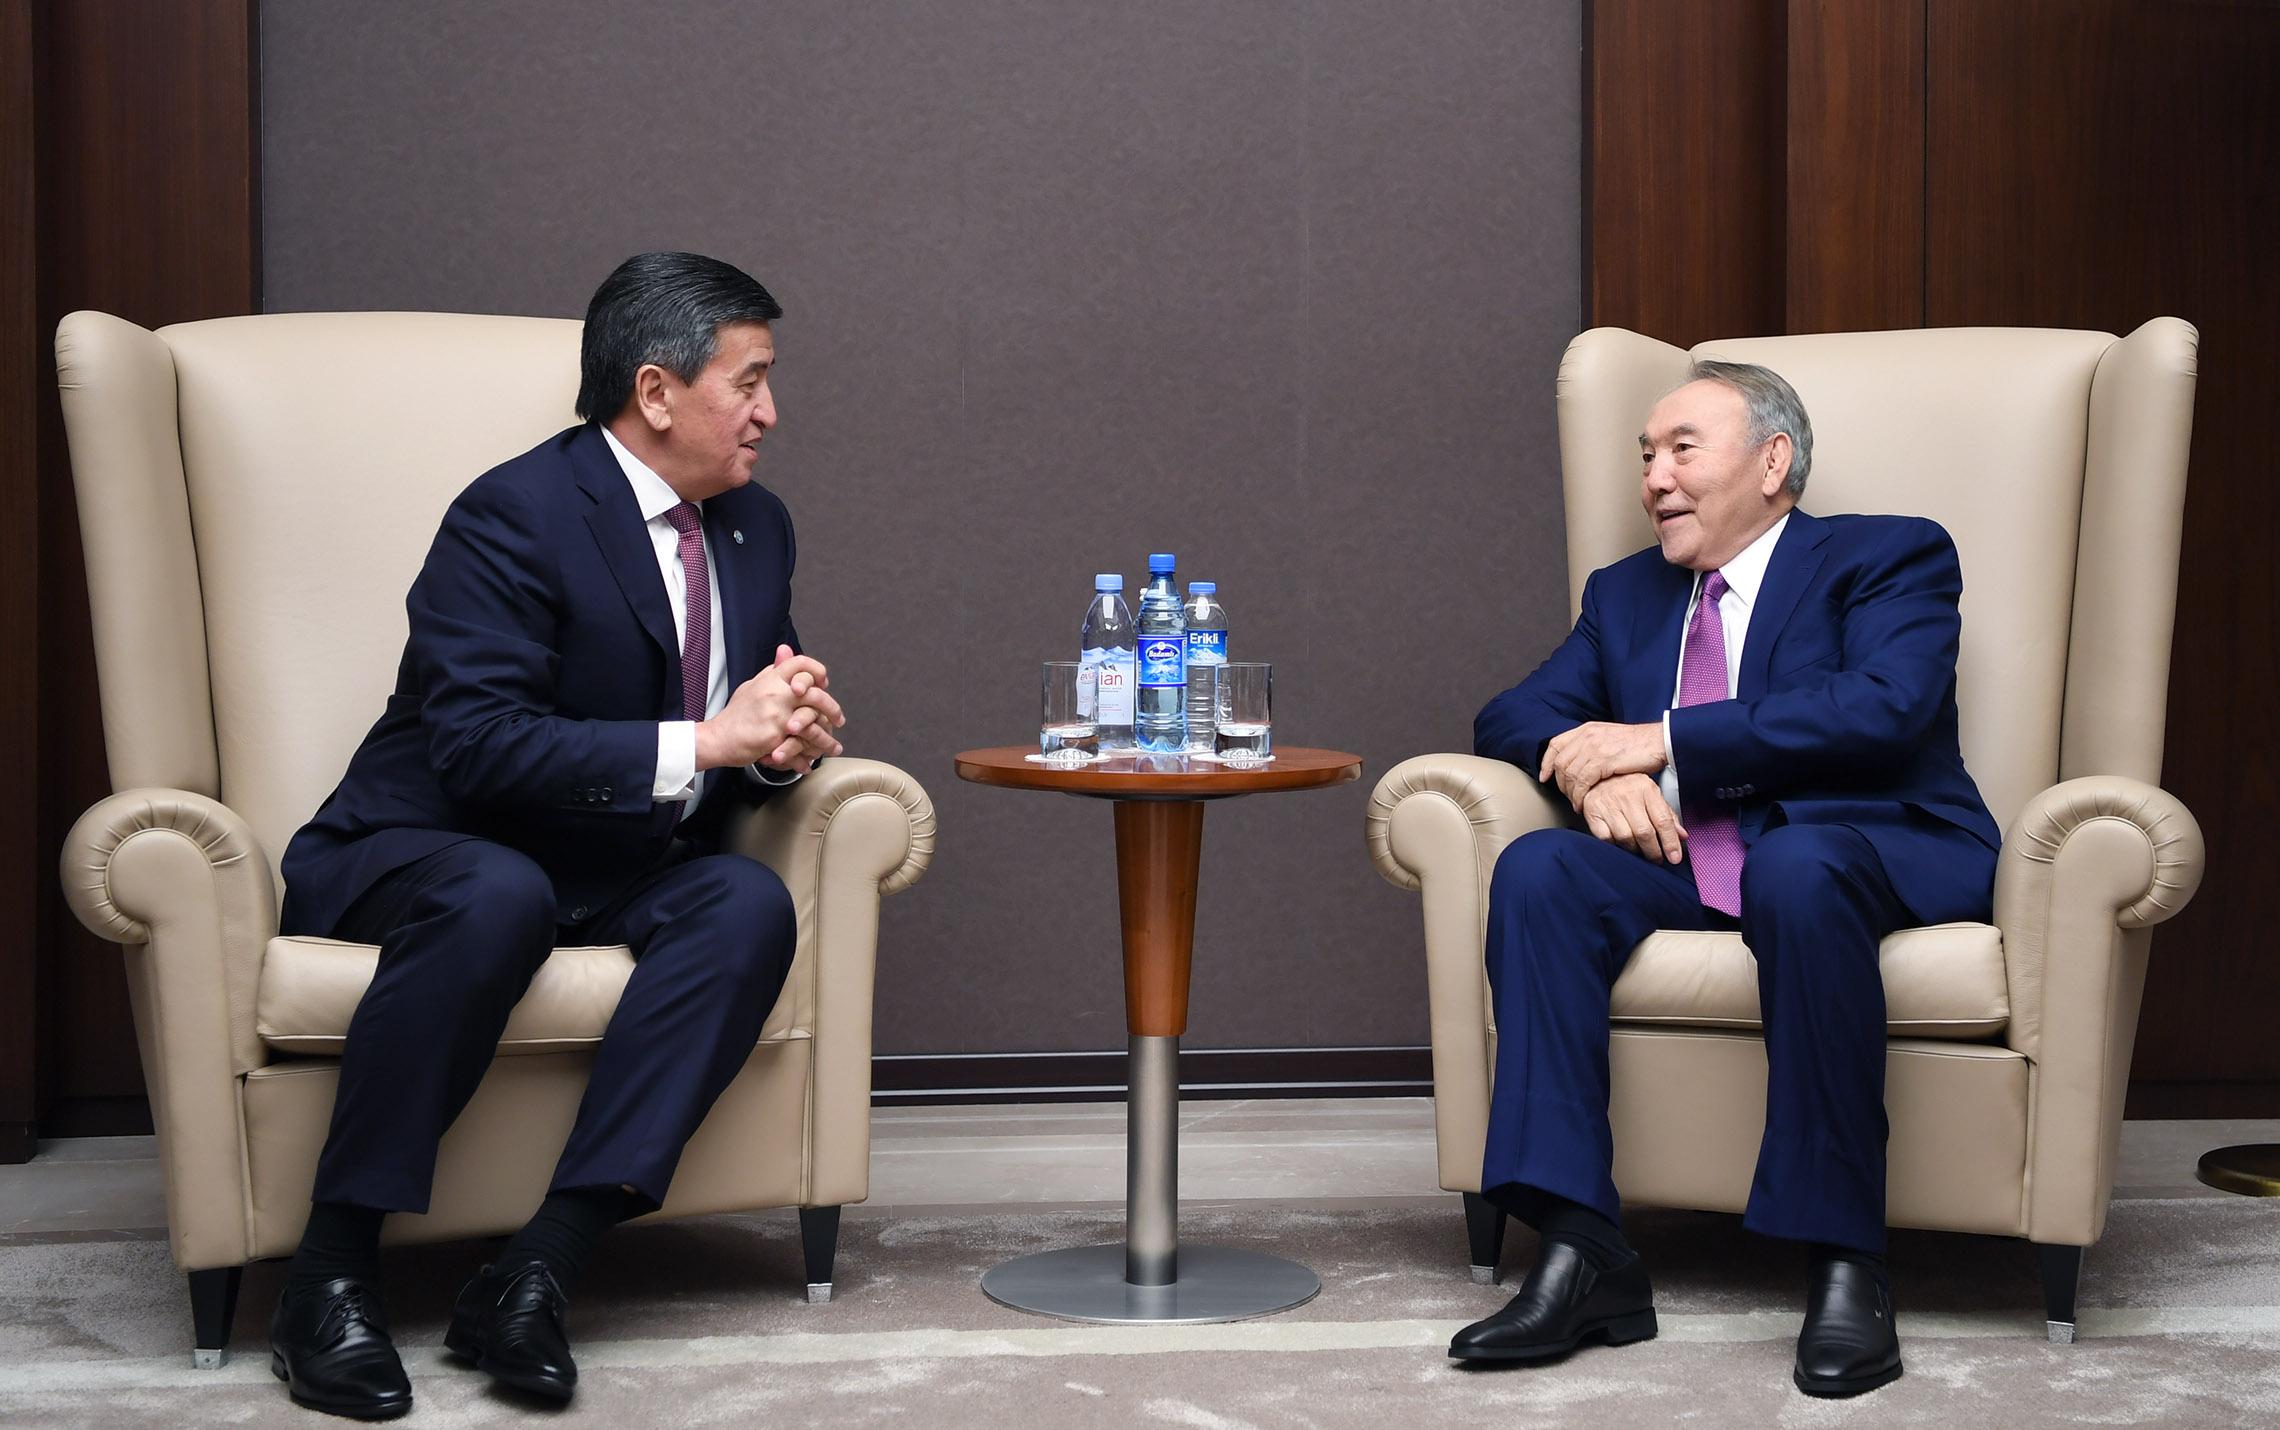 3aba04bd276a46be2d723a66eb93ceaf - Nursultan Nazarbayev met with Sooronbai Jeenbekov in Baku